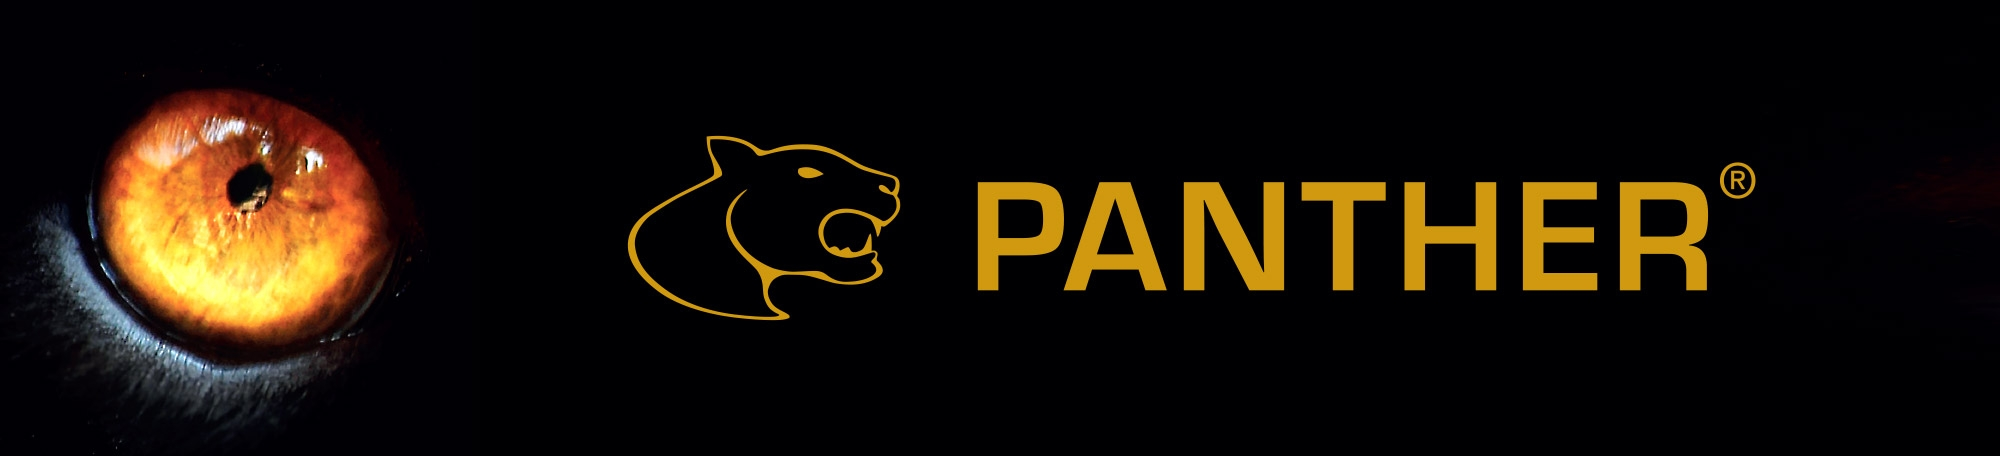 Panther - Redskapsboden.se